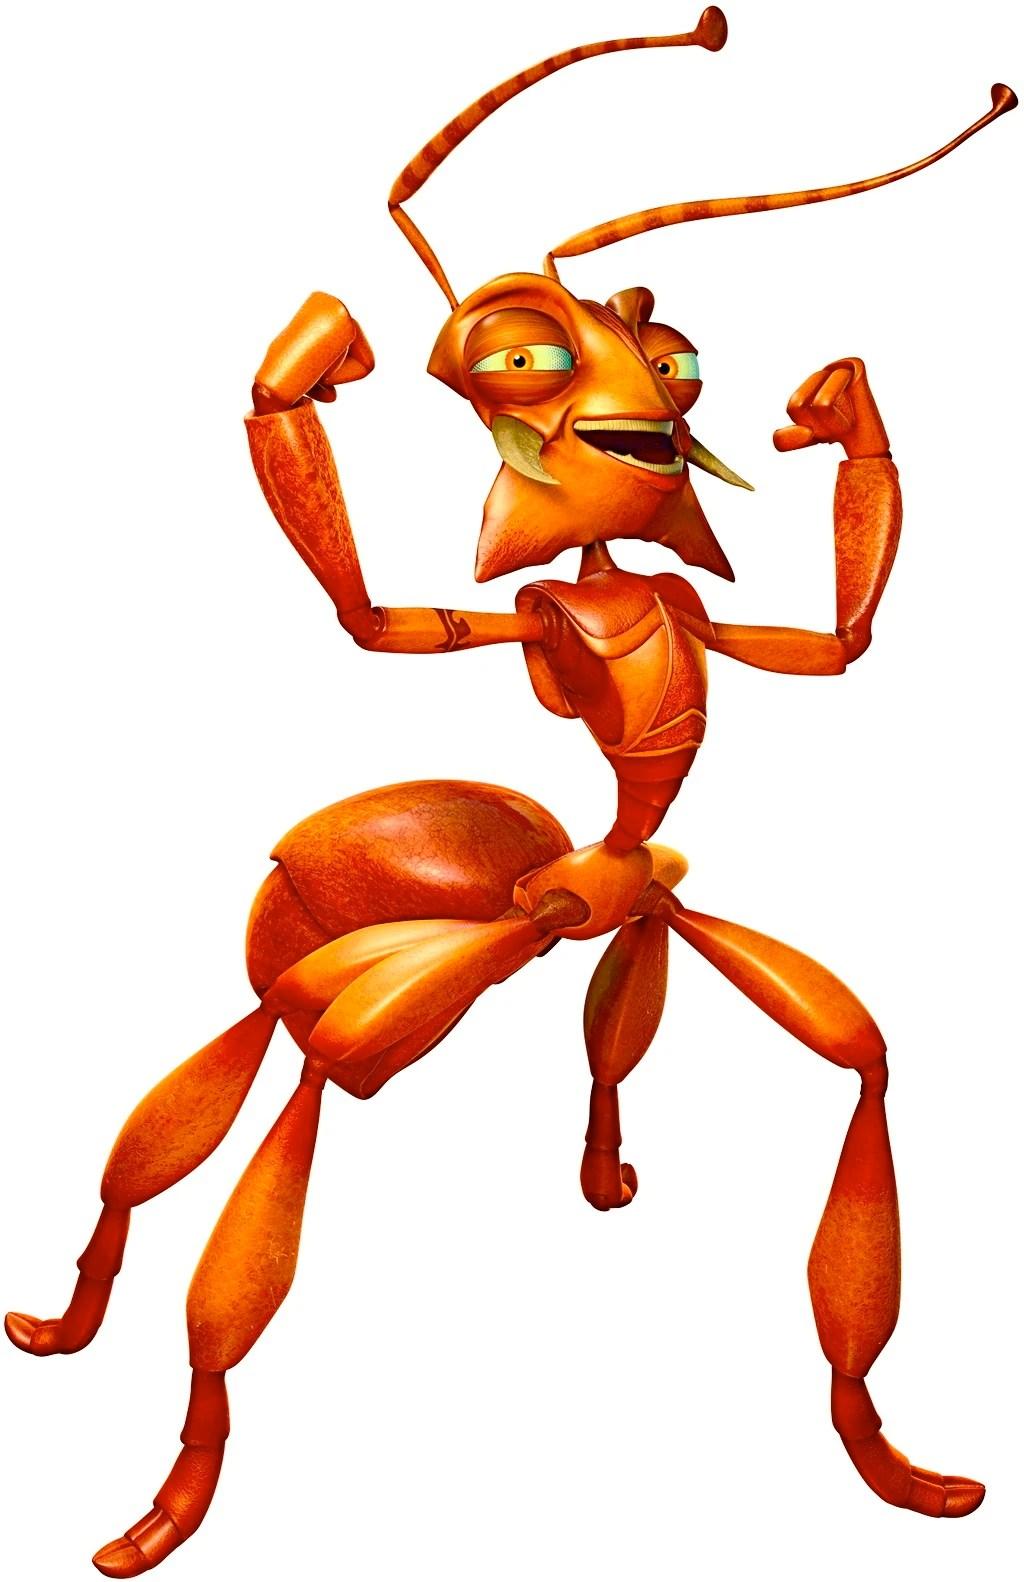 Fugax In Ant Bully By Joseph11stanton D64g5yo